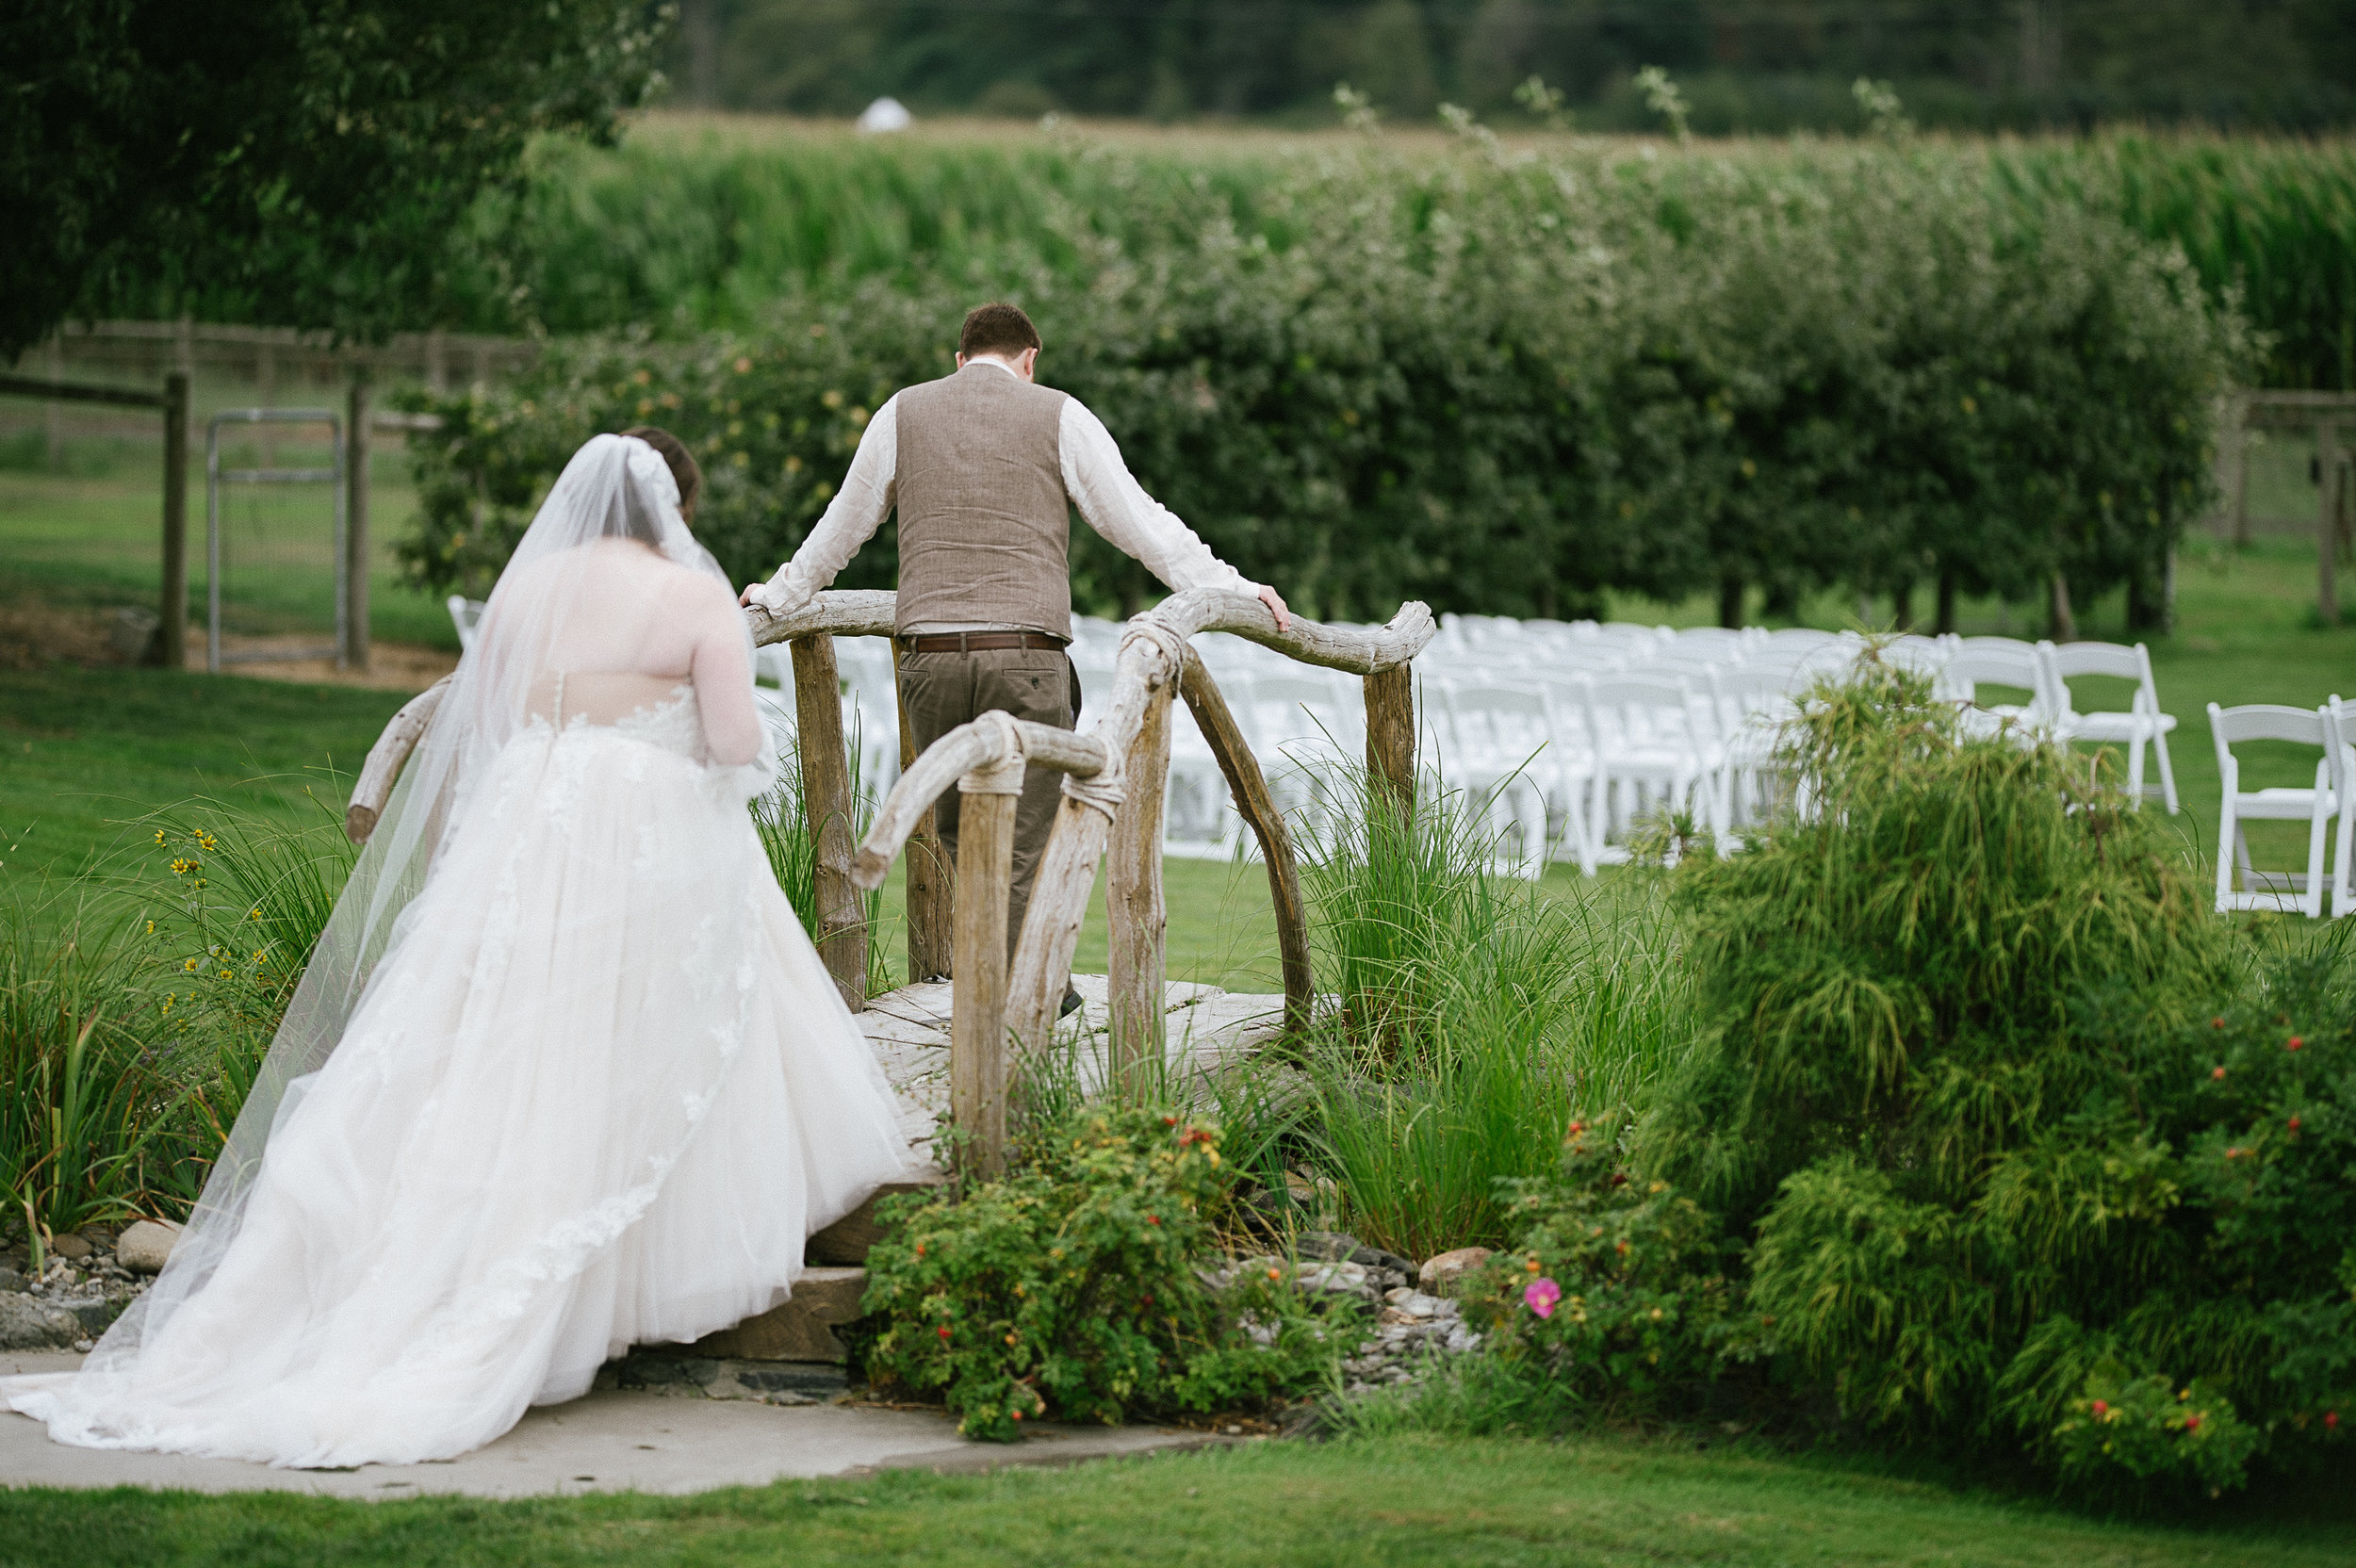 Swan Trail Farm Wedding_Sarah Schurman + Brian Skadan_Snohomish Wedding_Kelsey Lane Photography-5716.jpg